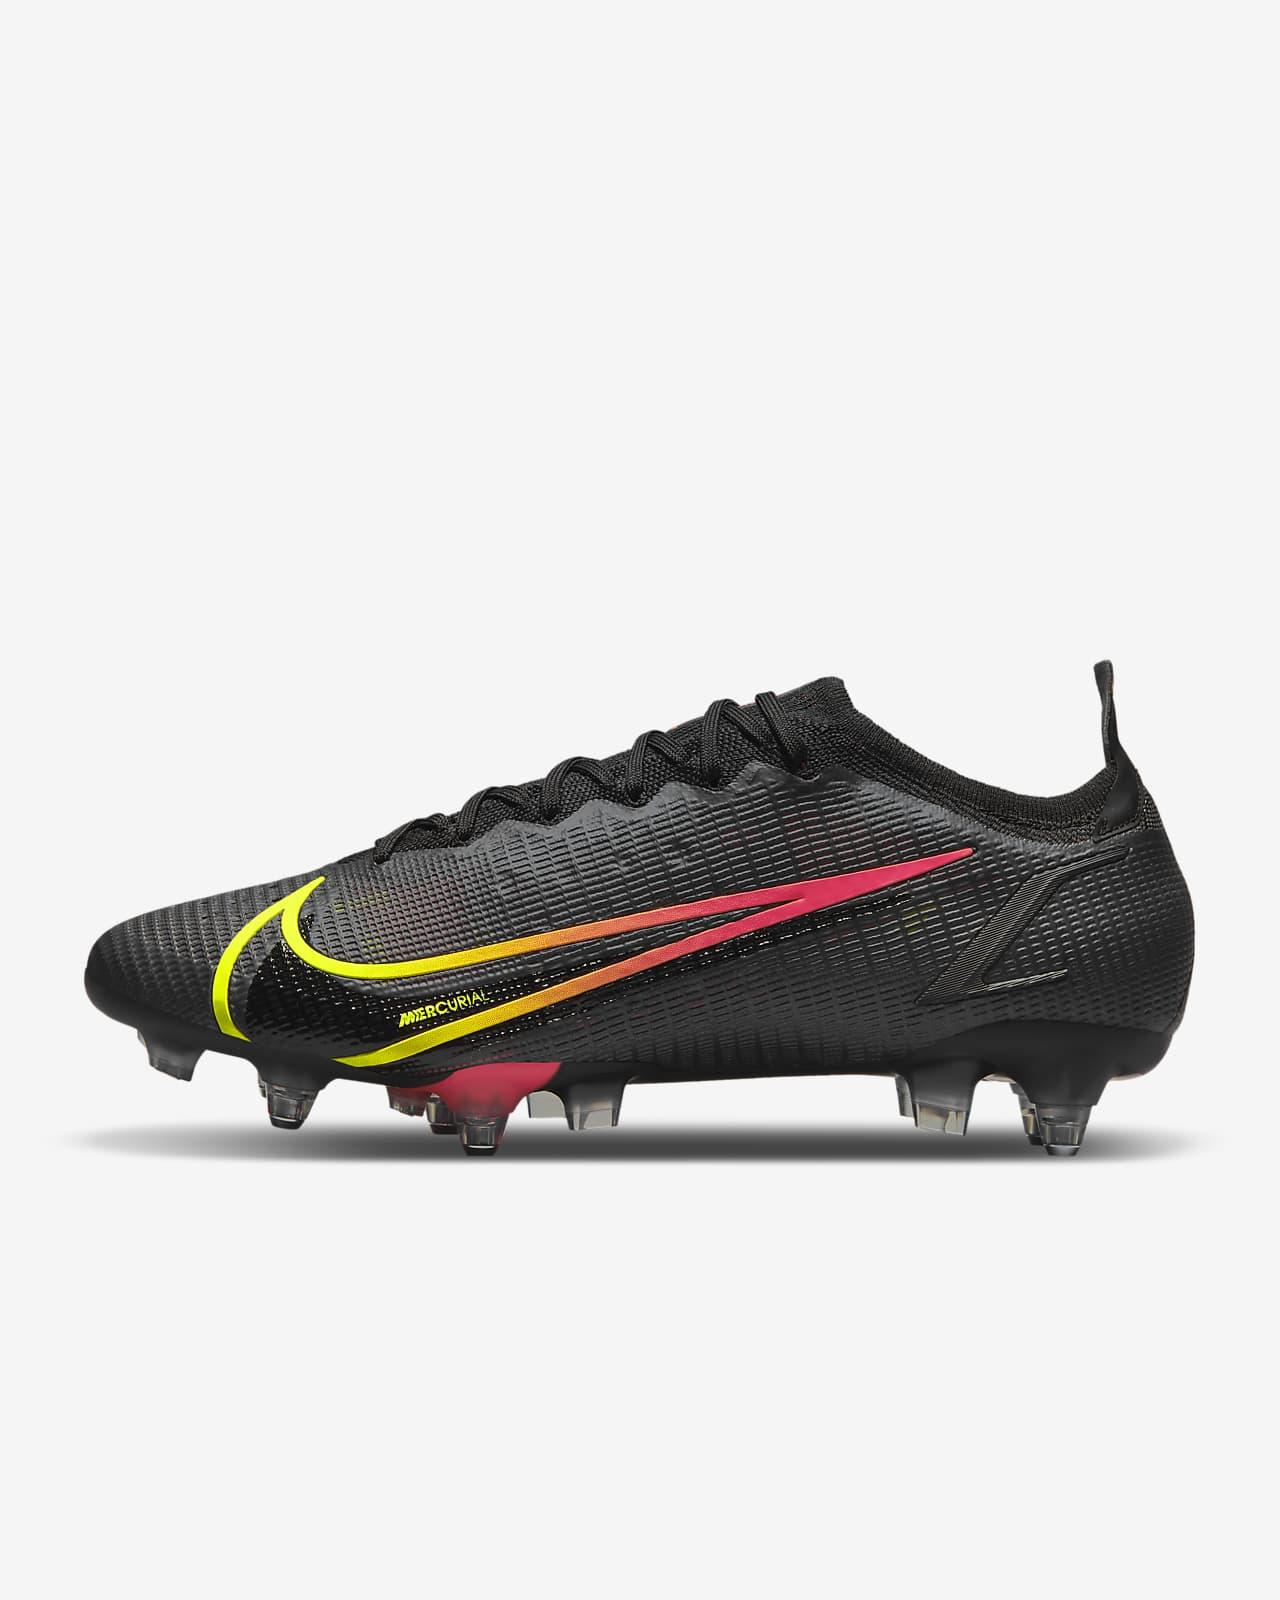 Nike Mercurial Vapor 14 Elite SG-Pro AC Botas de fútbol para terreno blando